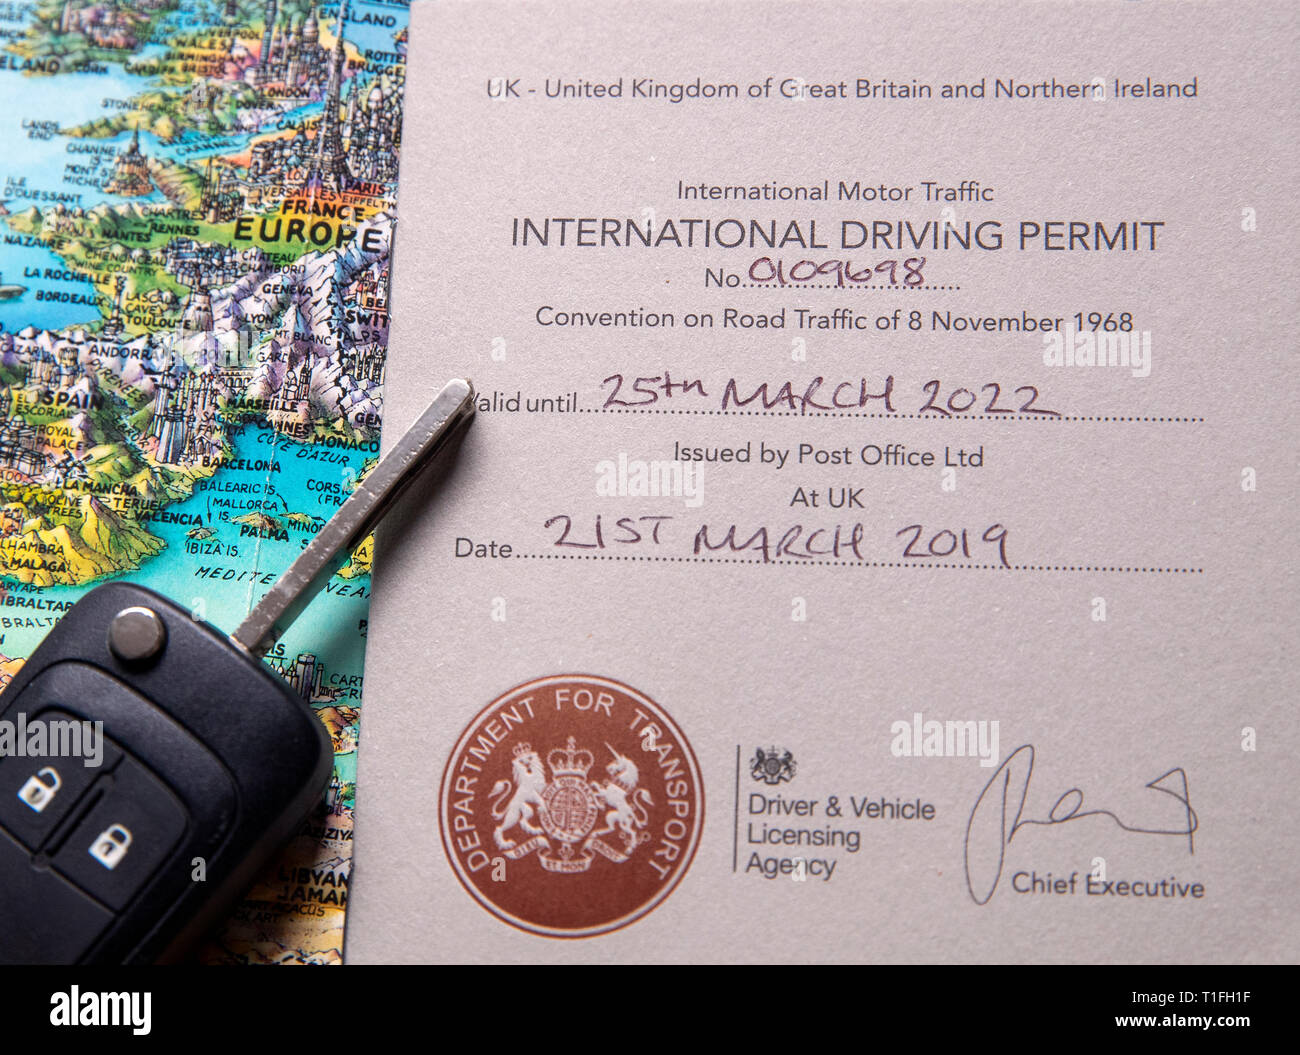 ama international drivers license